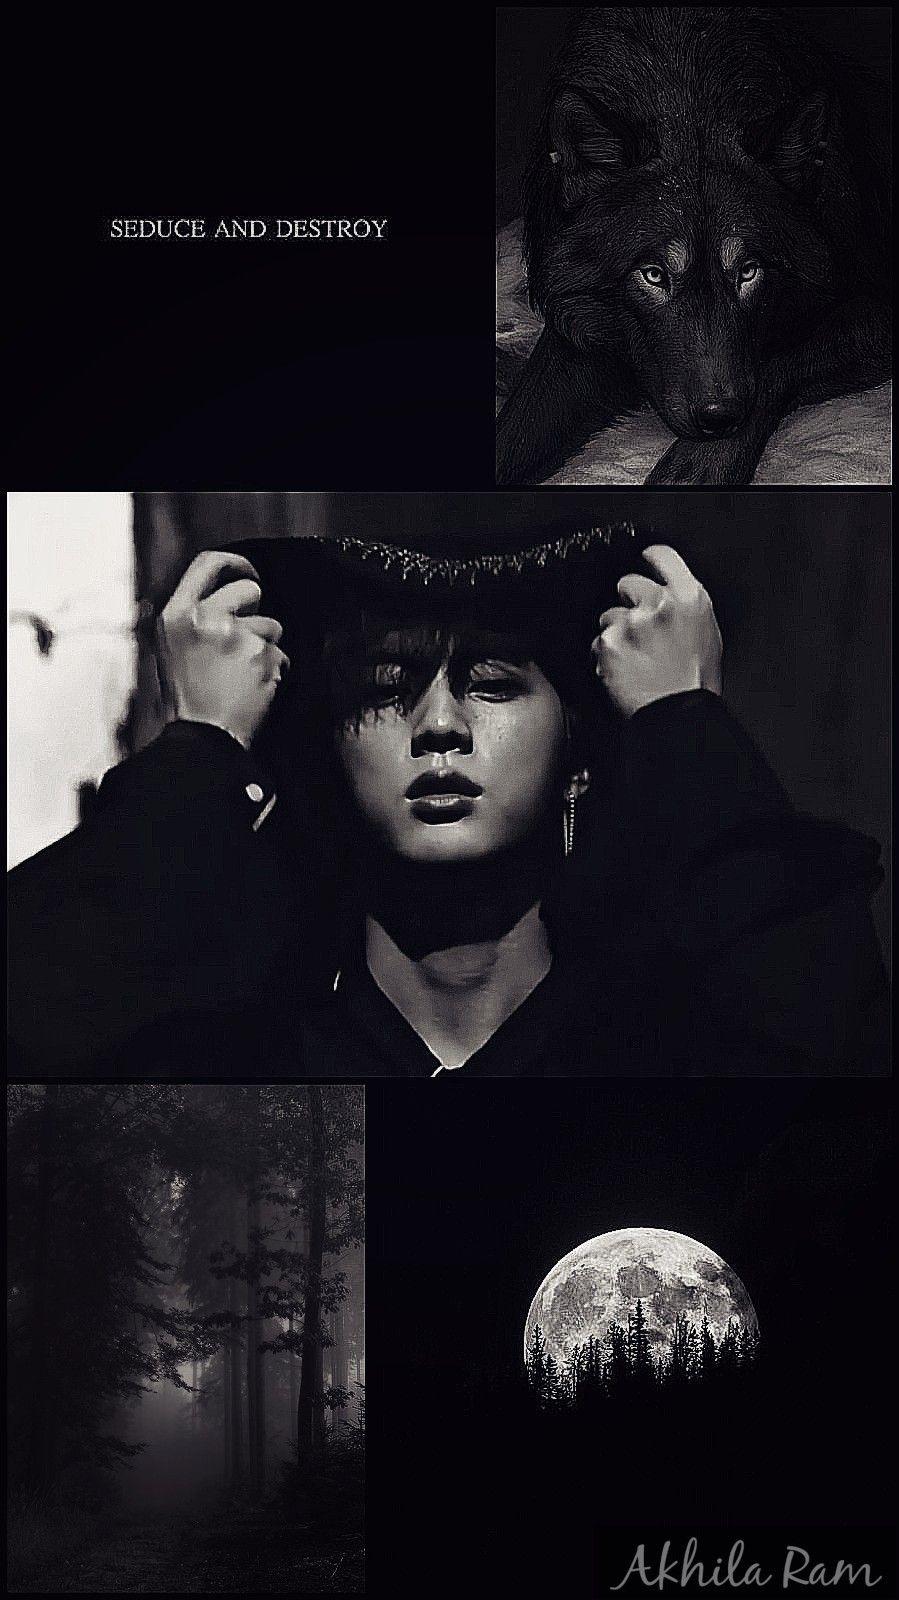 Bts Aesthetic Kim Seokjin Jin Moodboard Wallpaper Do Not Edit Suami Saya